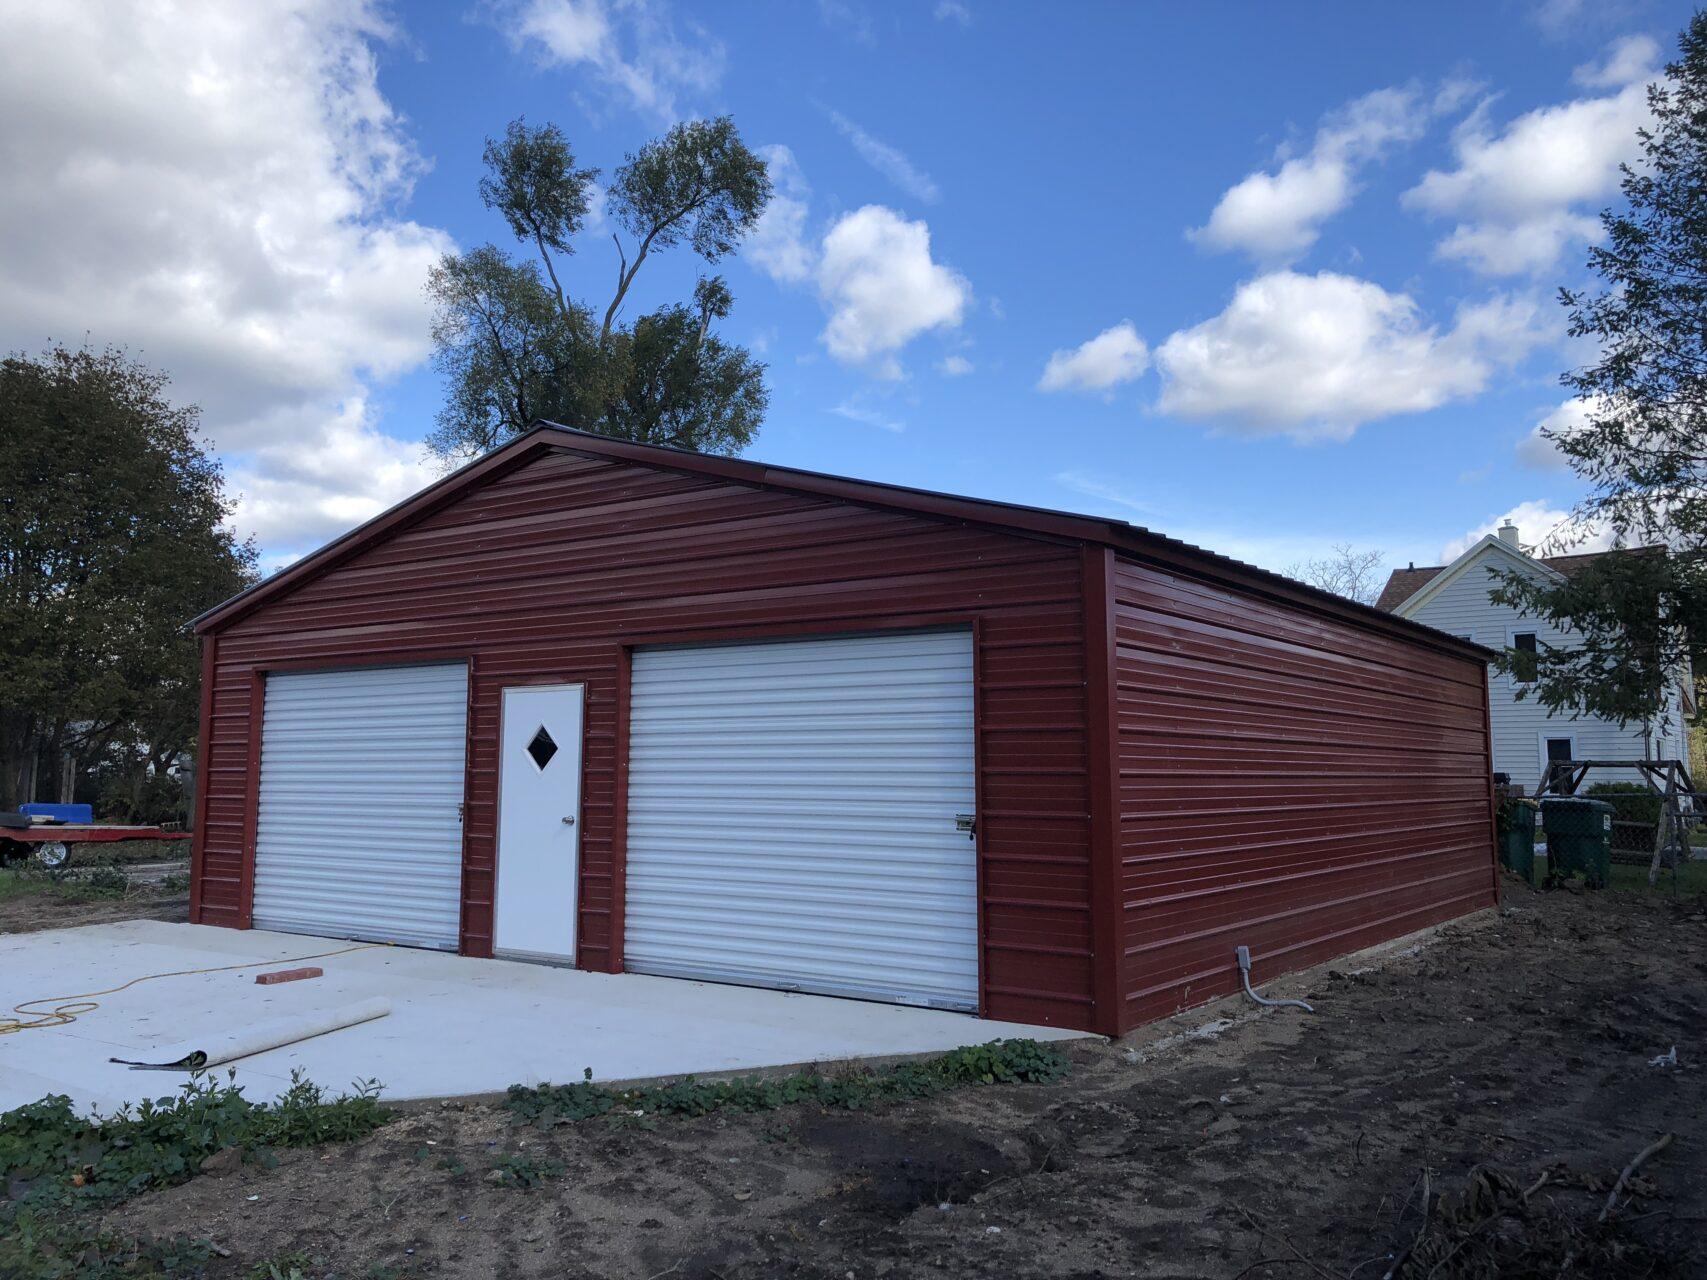 28x30x9 Metal Two Stall Garage